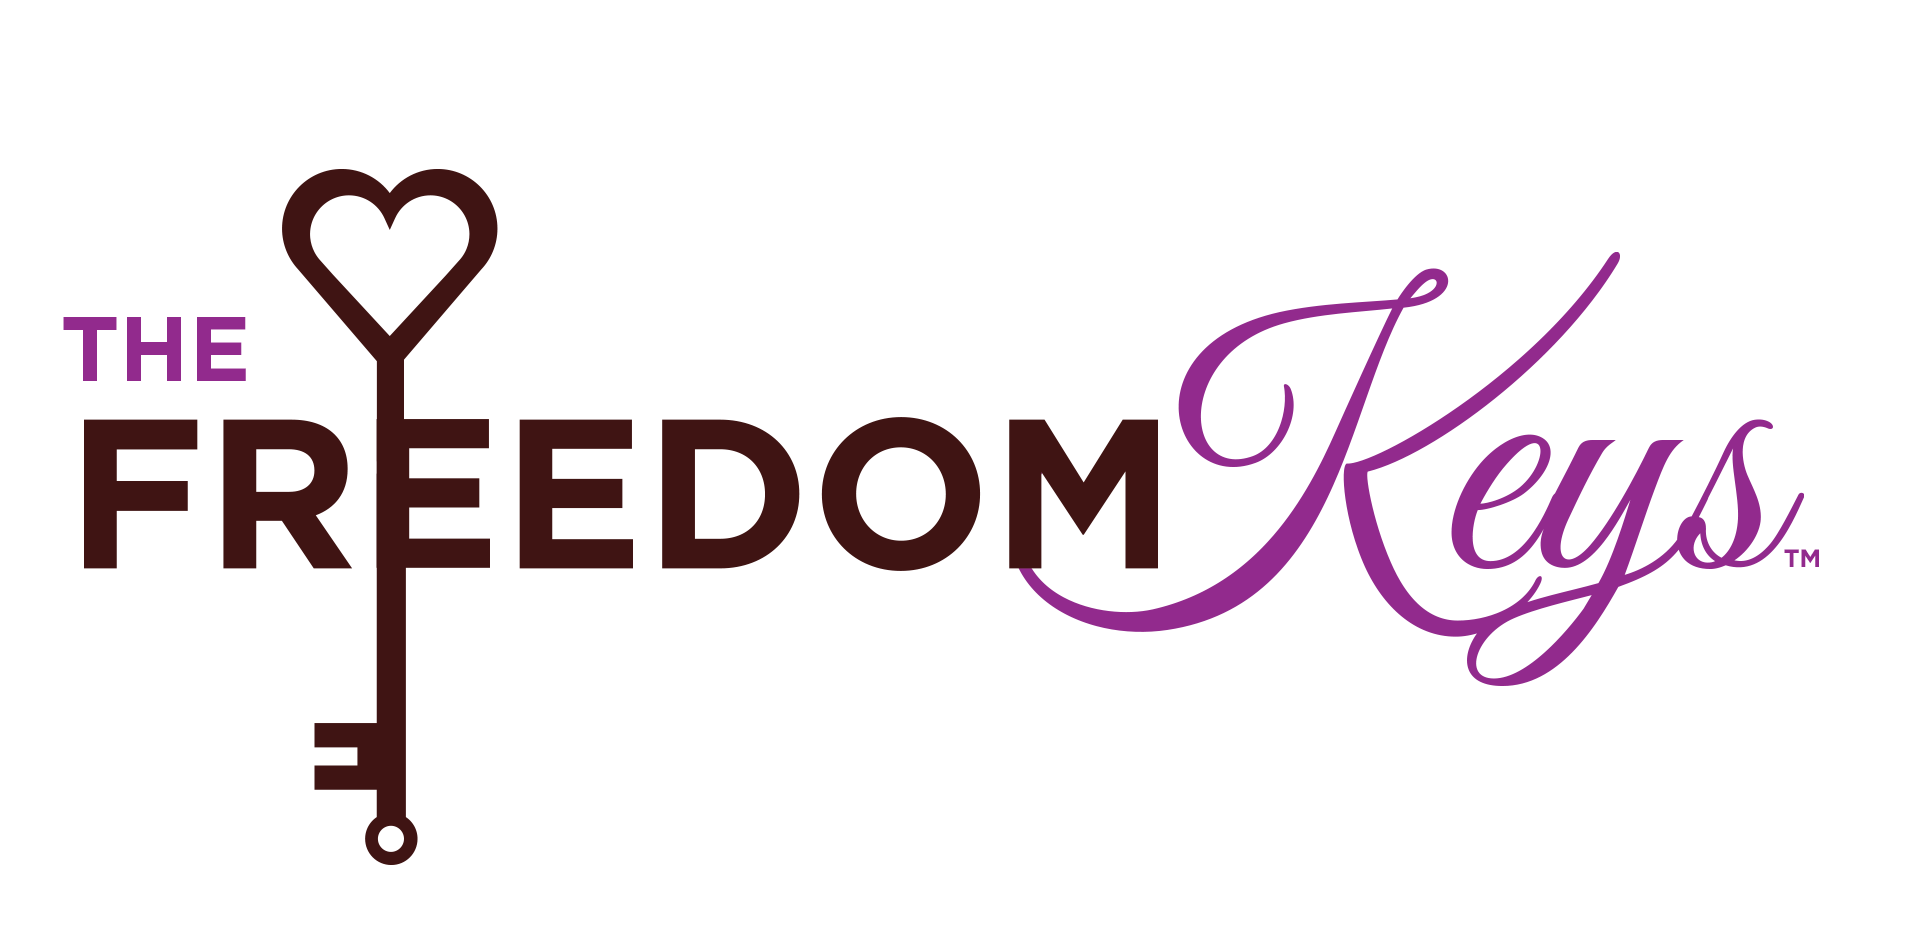 The Freedom Keys